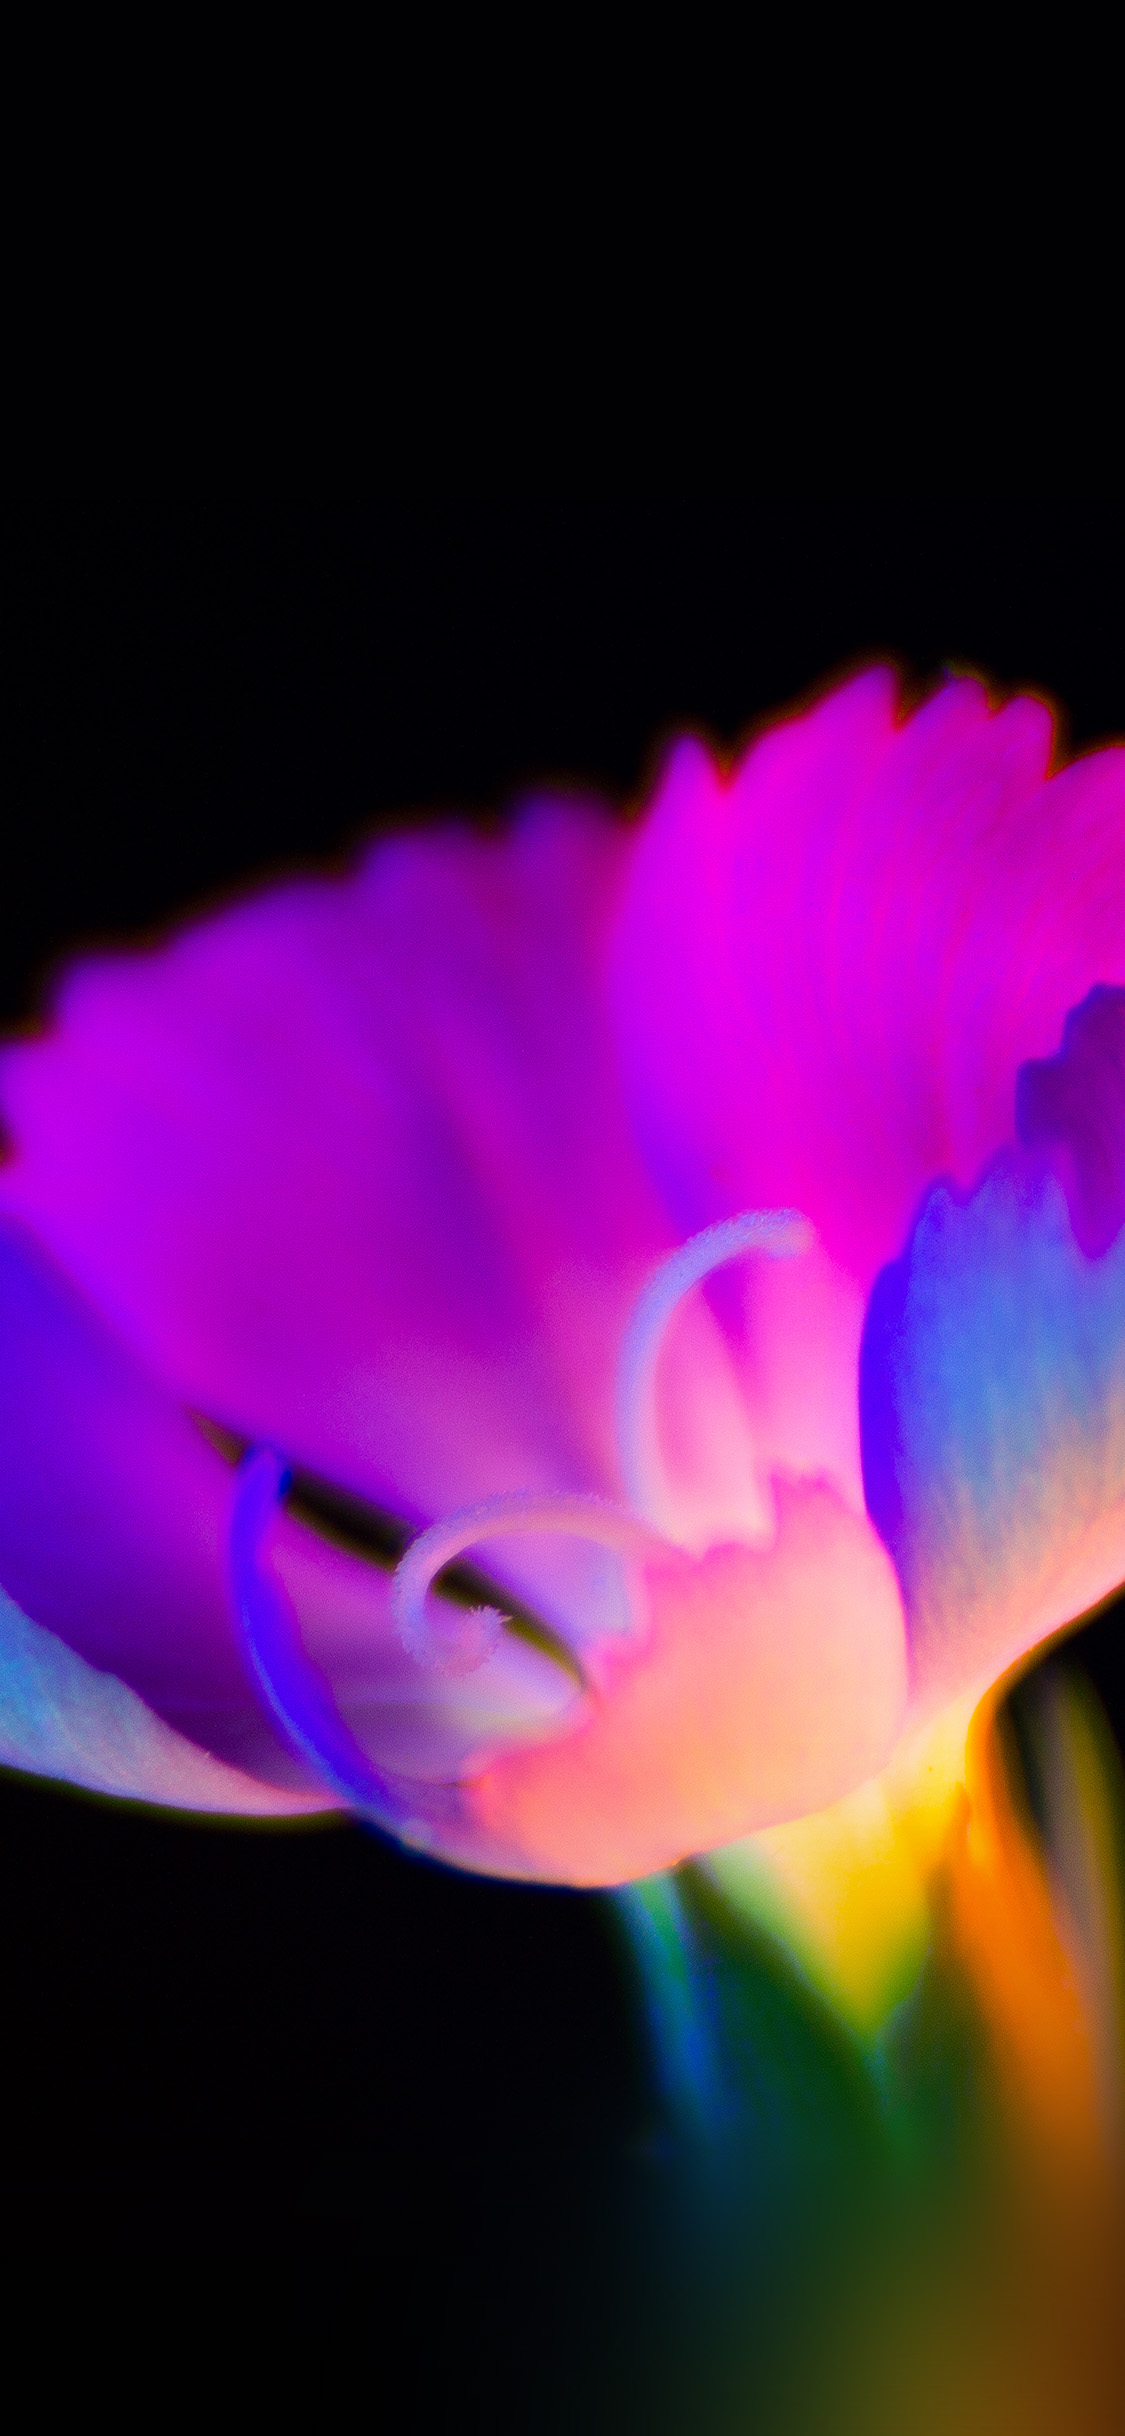 iPhonexpapers.com-Apple-iPhone-wallpaper-bg11-flower-dark-neon-color-art